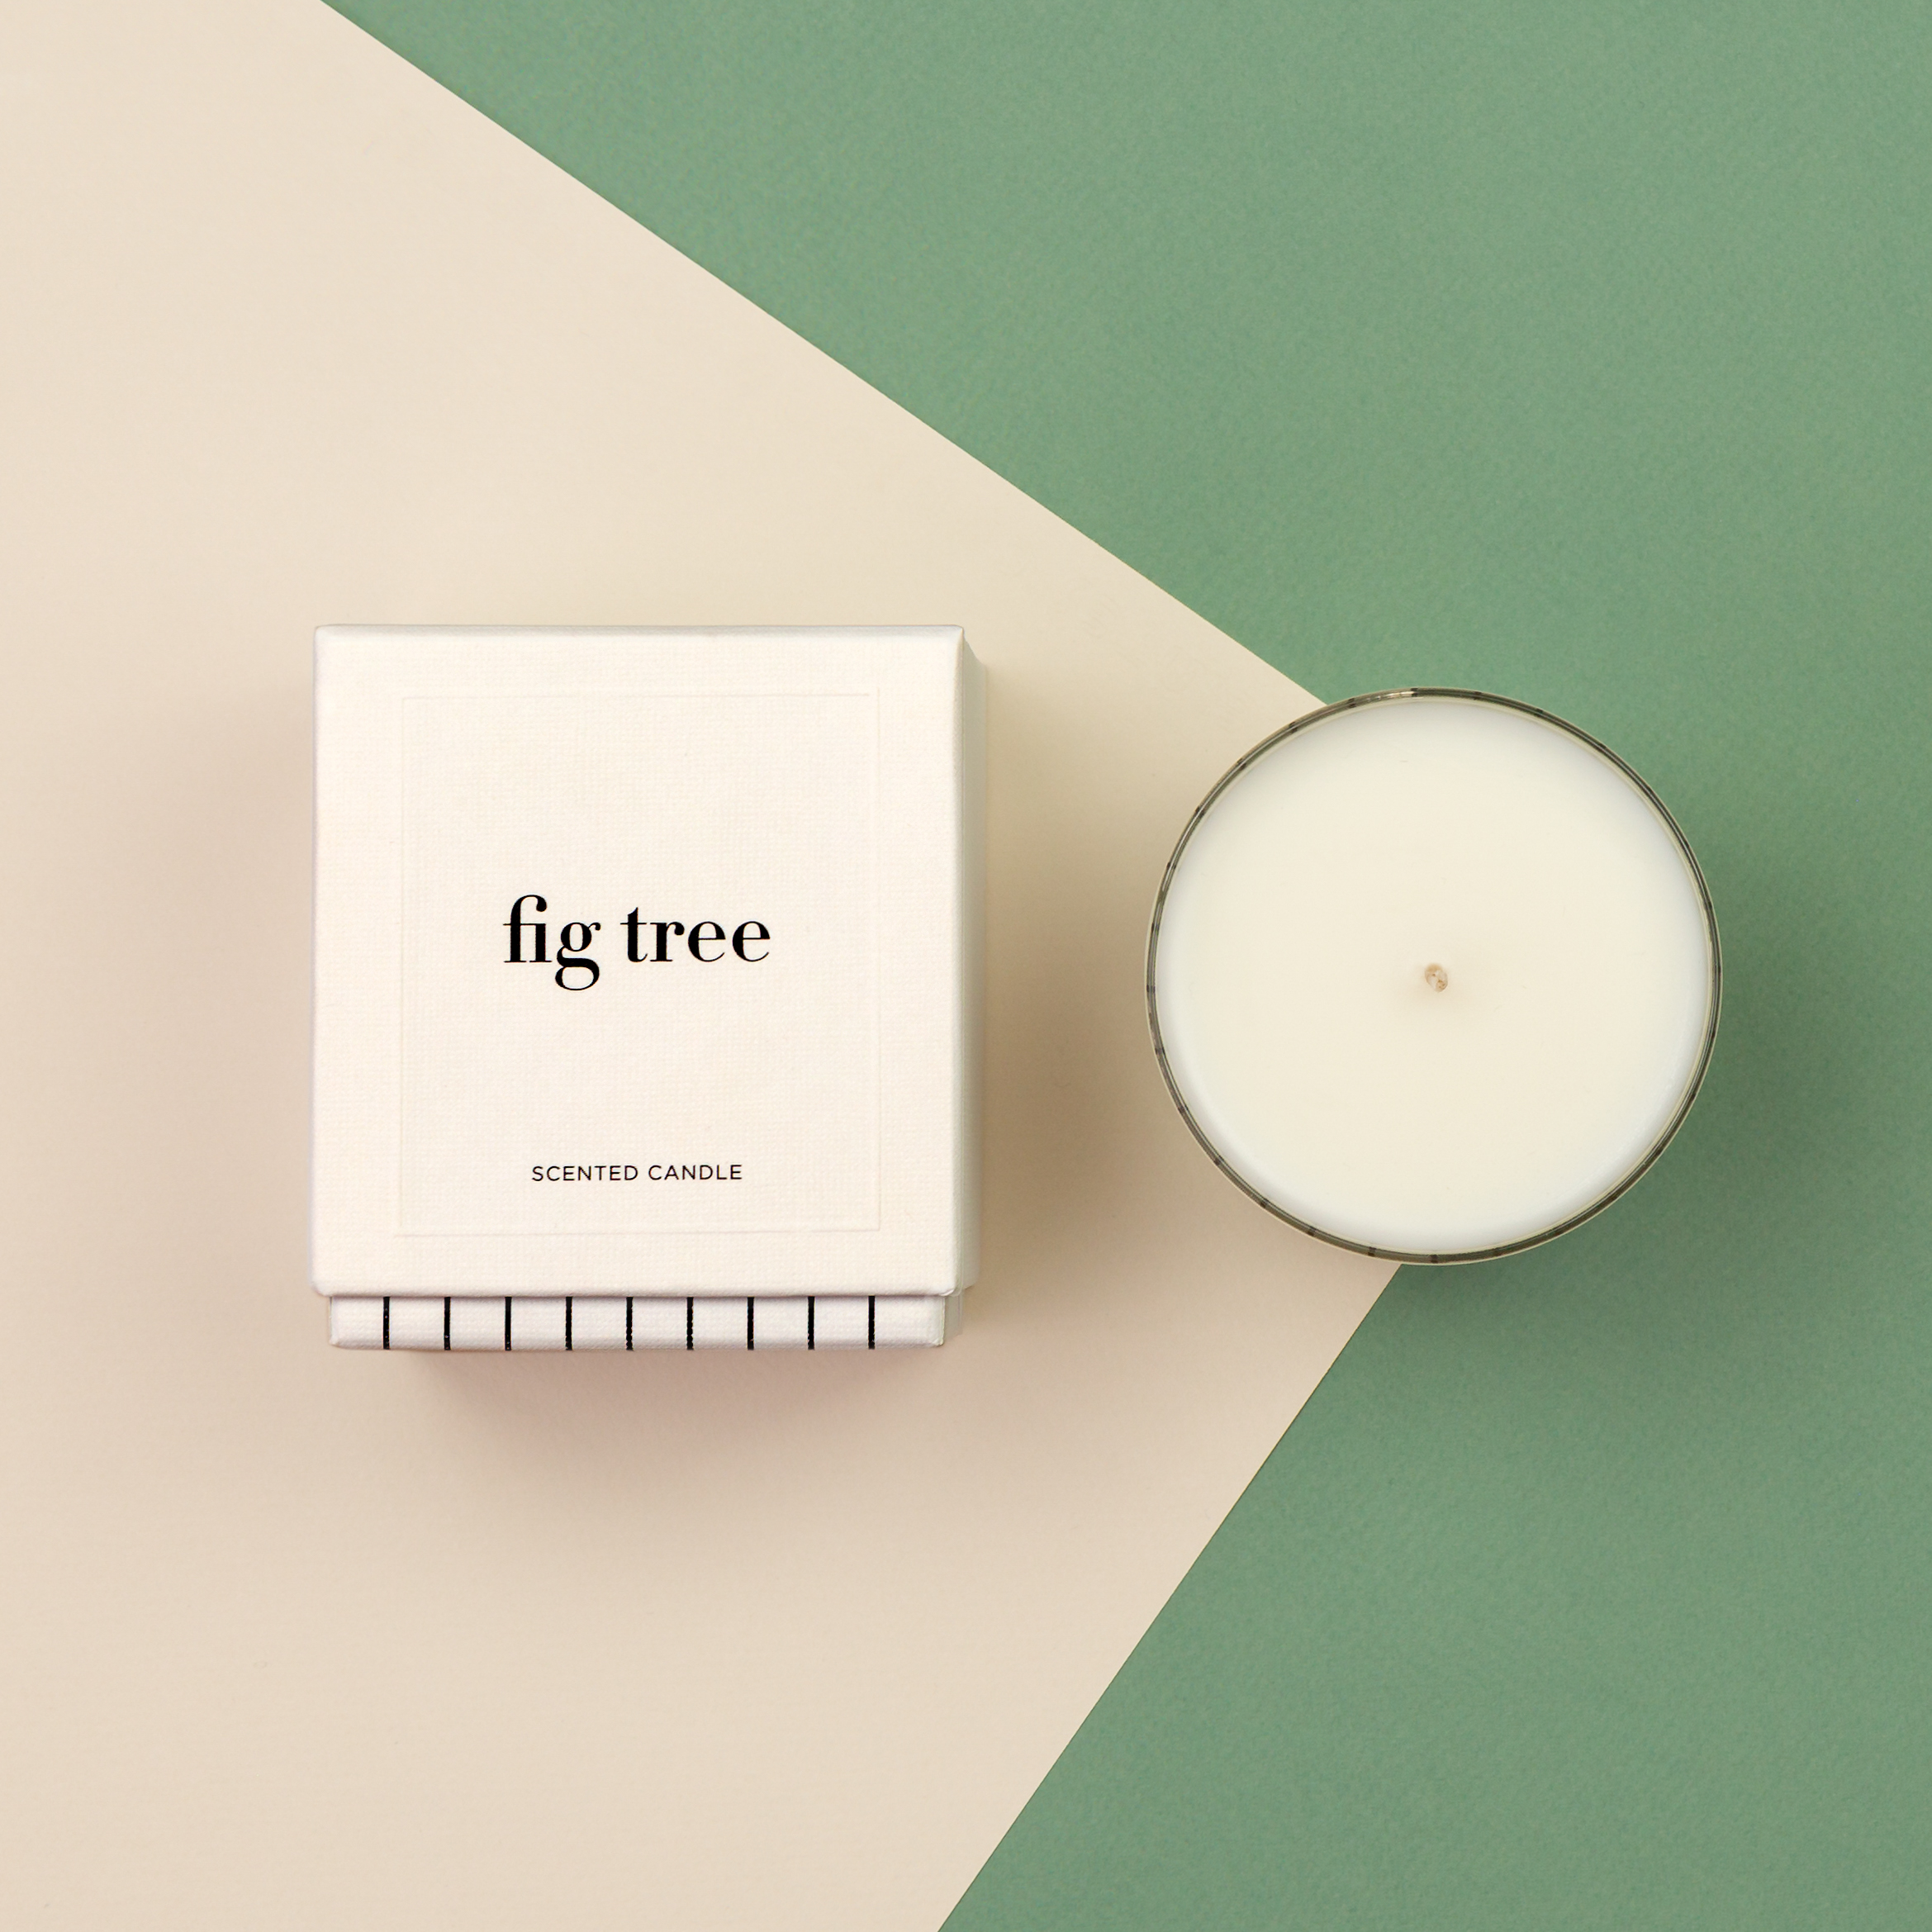 Studio_Stockhome_flat_fig tree.jpg